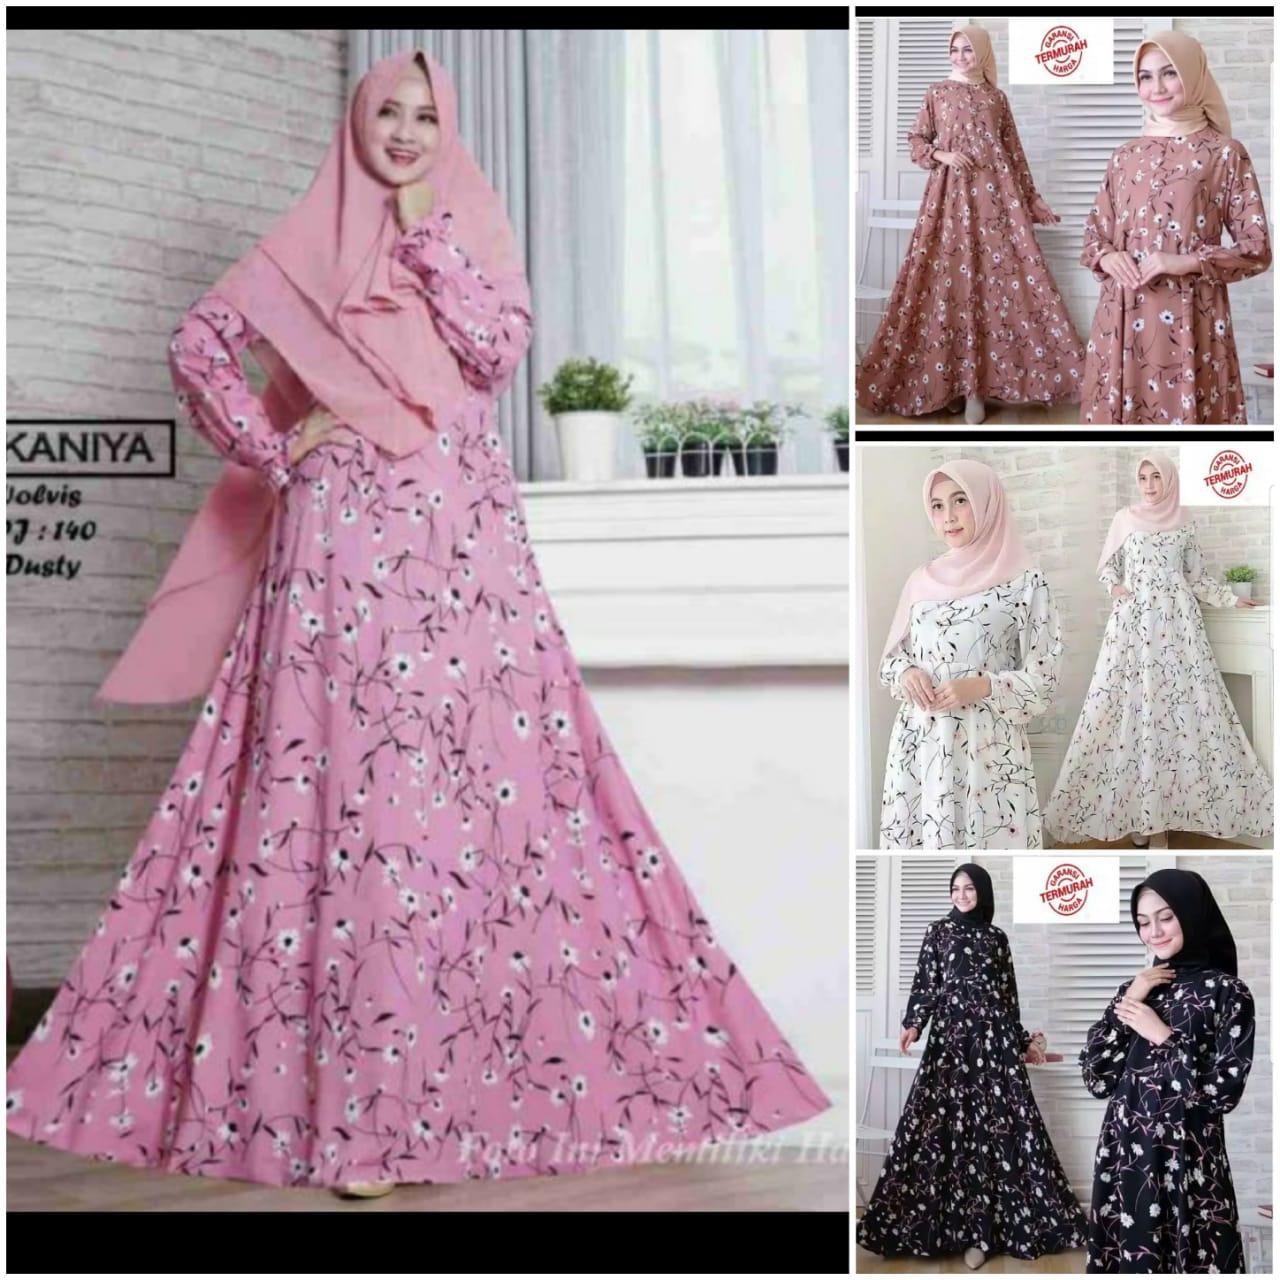 OT NDUDCOLL GAMIS SUNRISE Dress Muslimah / Hijab Muslim / Gamis Syari / Baju Muslim / Fashion Muslim / Dress Muslim / Fashion Maxi / Setelan Muslim / Atasan Muslimah / Kebaya Modern